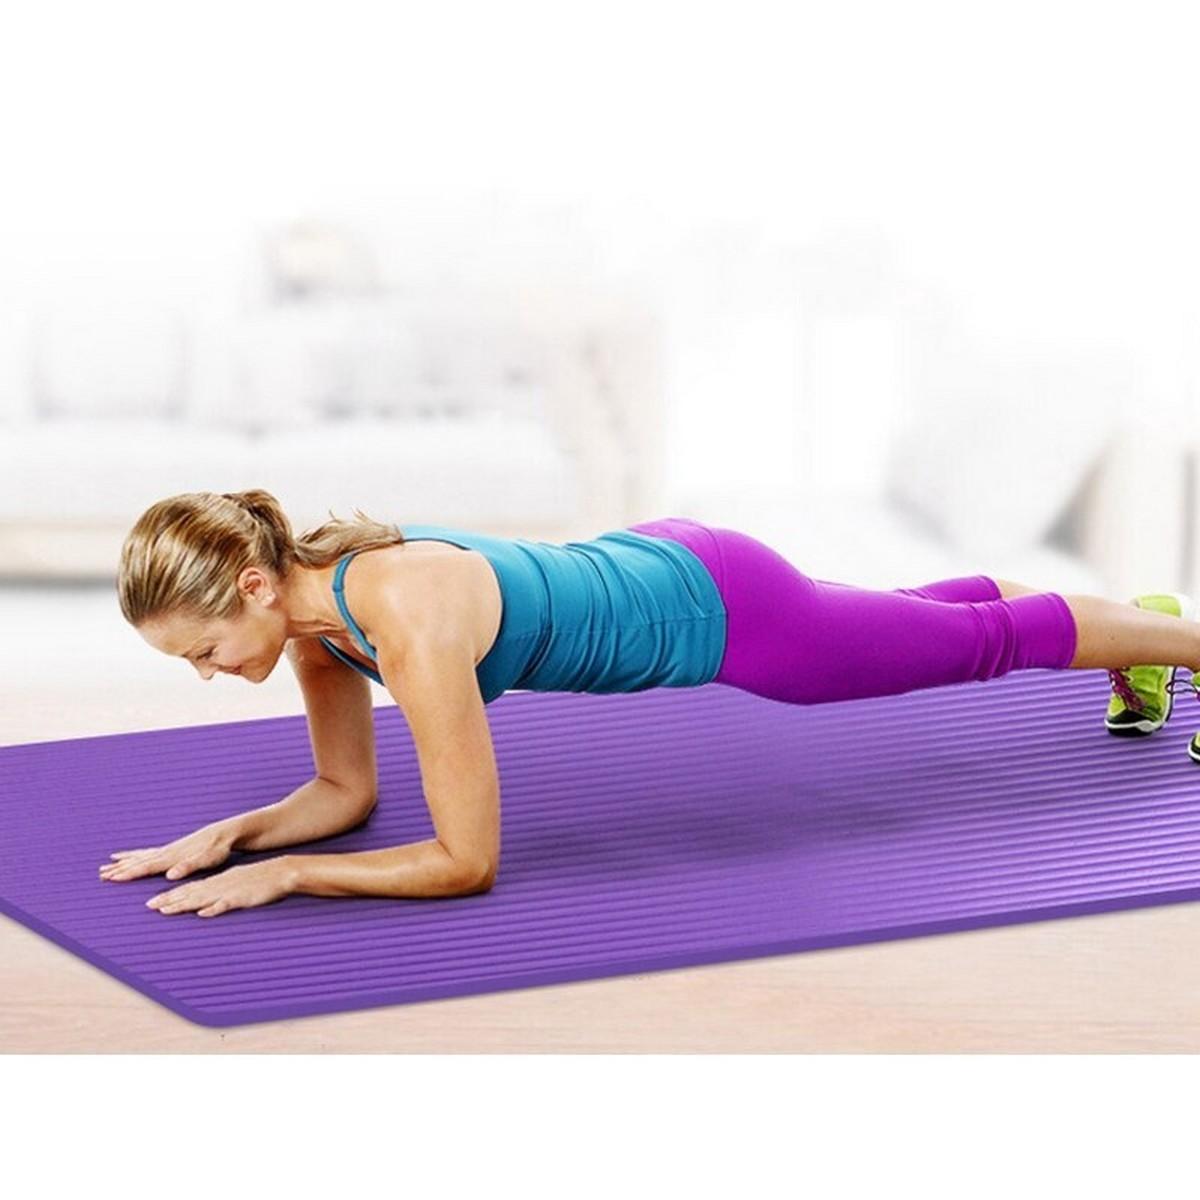 Yoga Mat Sport Mat Yoga non-slip acupressure Exercise For Gym Floor With Position Line Non-slip For Beginner Mats 4mm thickness